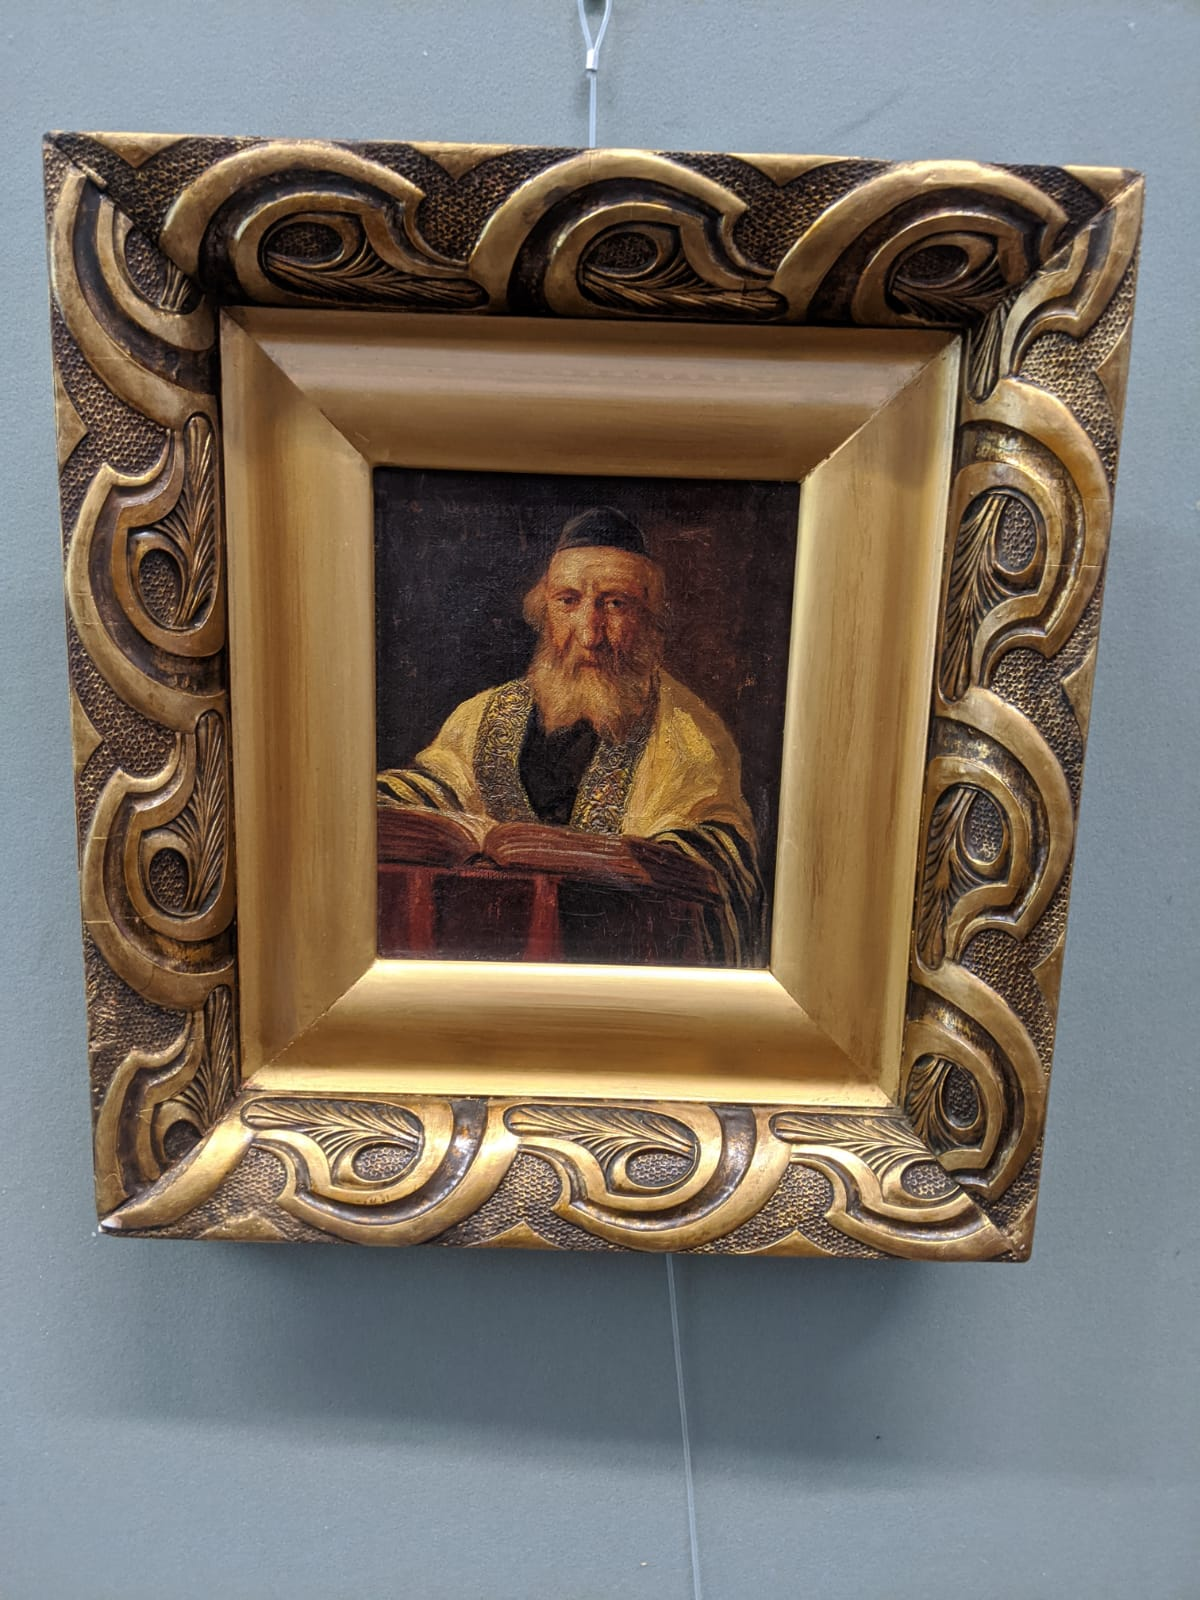 Jose Schneider (American/Spanish, 1848-1893), Rabbi Studying and Rabbi, oils on canvas, both - Image 2 of 7